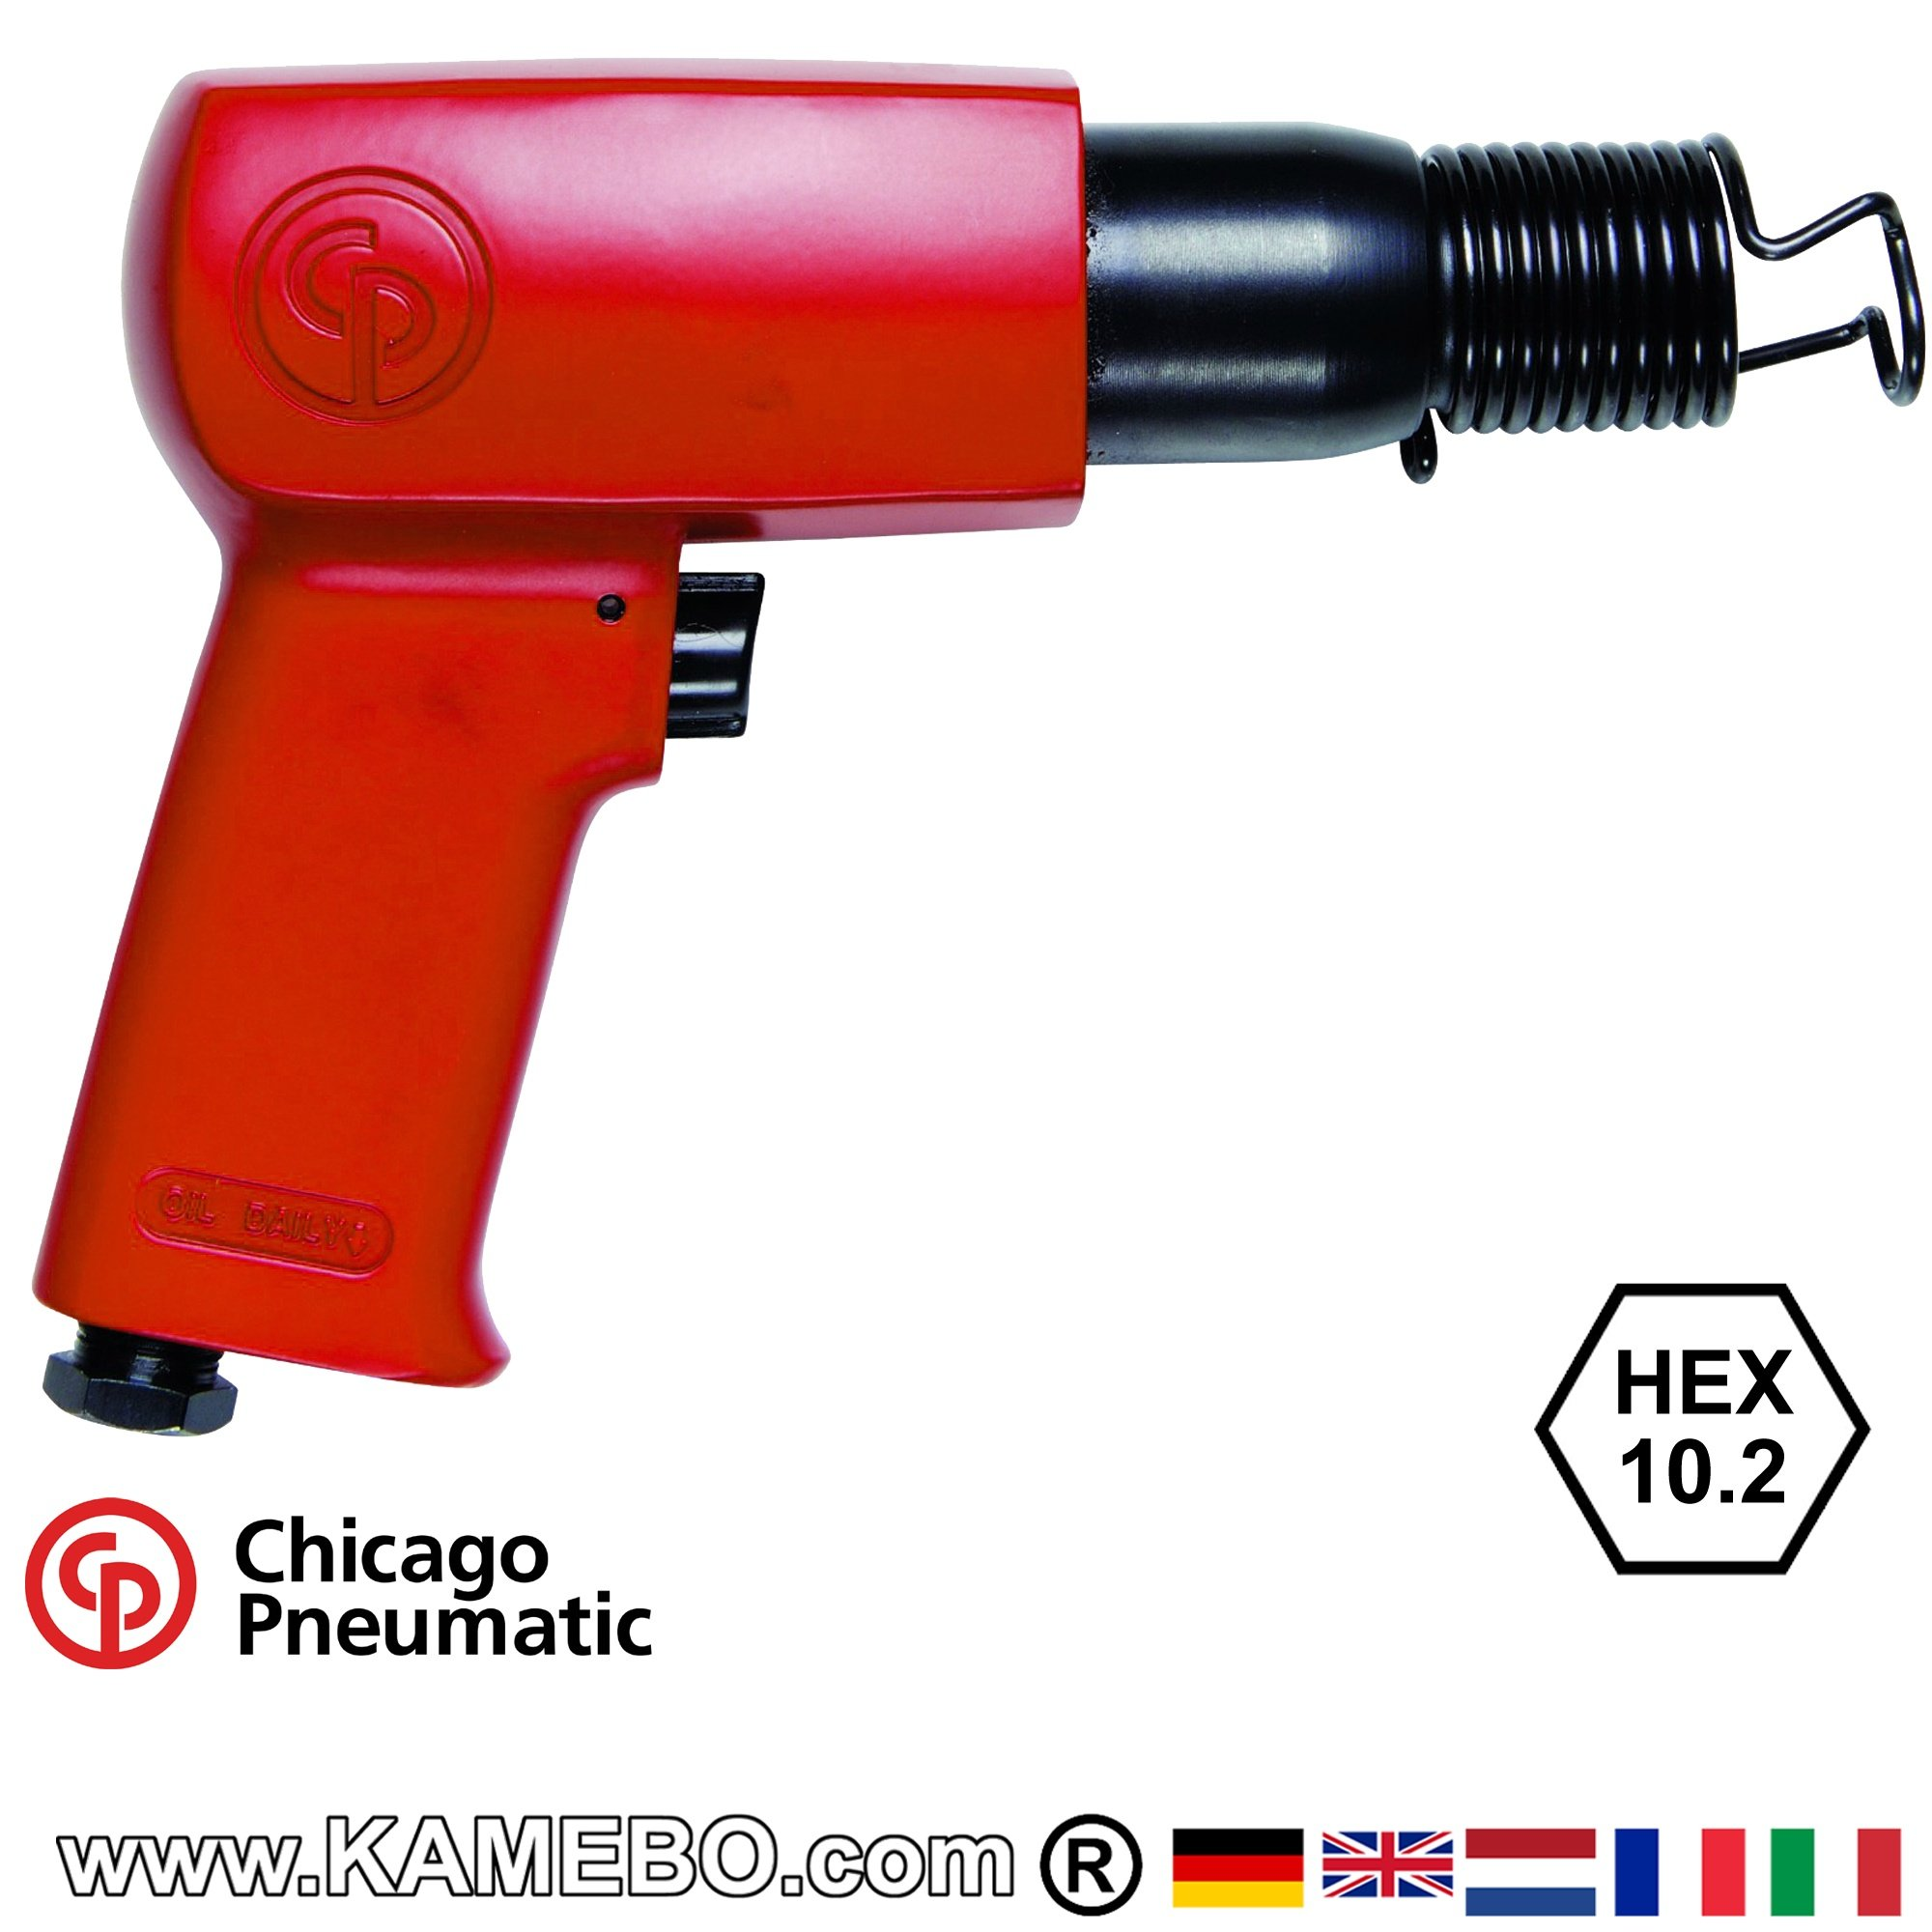 Chicago pneumatic marteau burineur pneumatique cp7111hex kamebo - Marteau burineur pneumatique ...